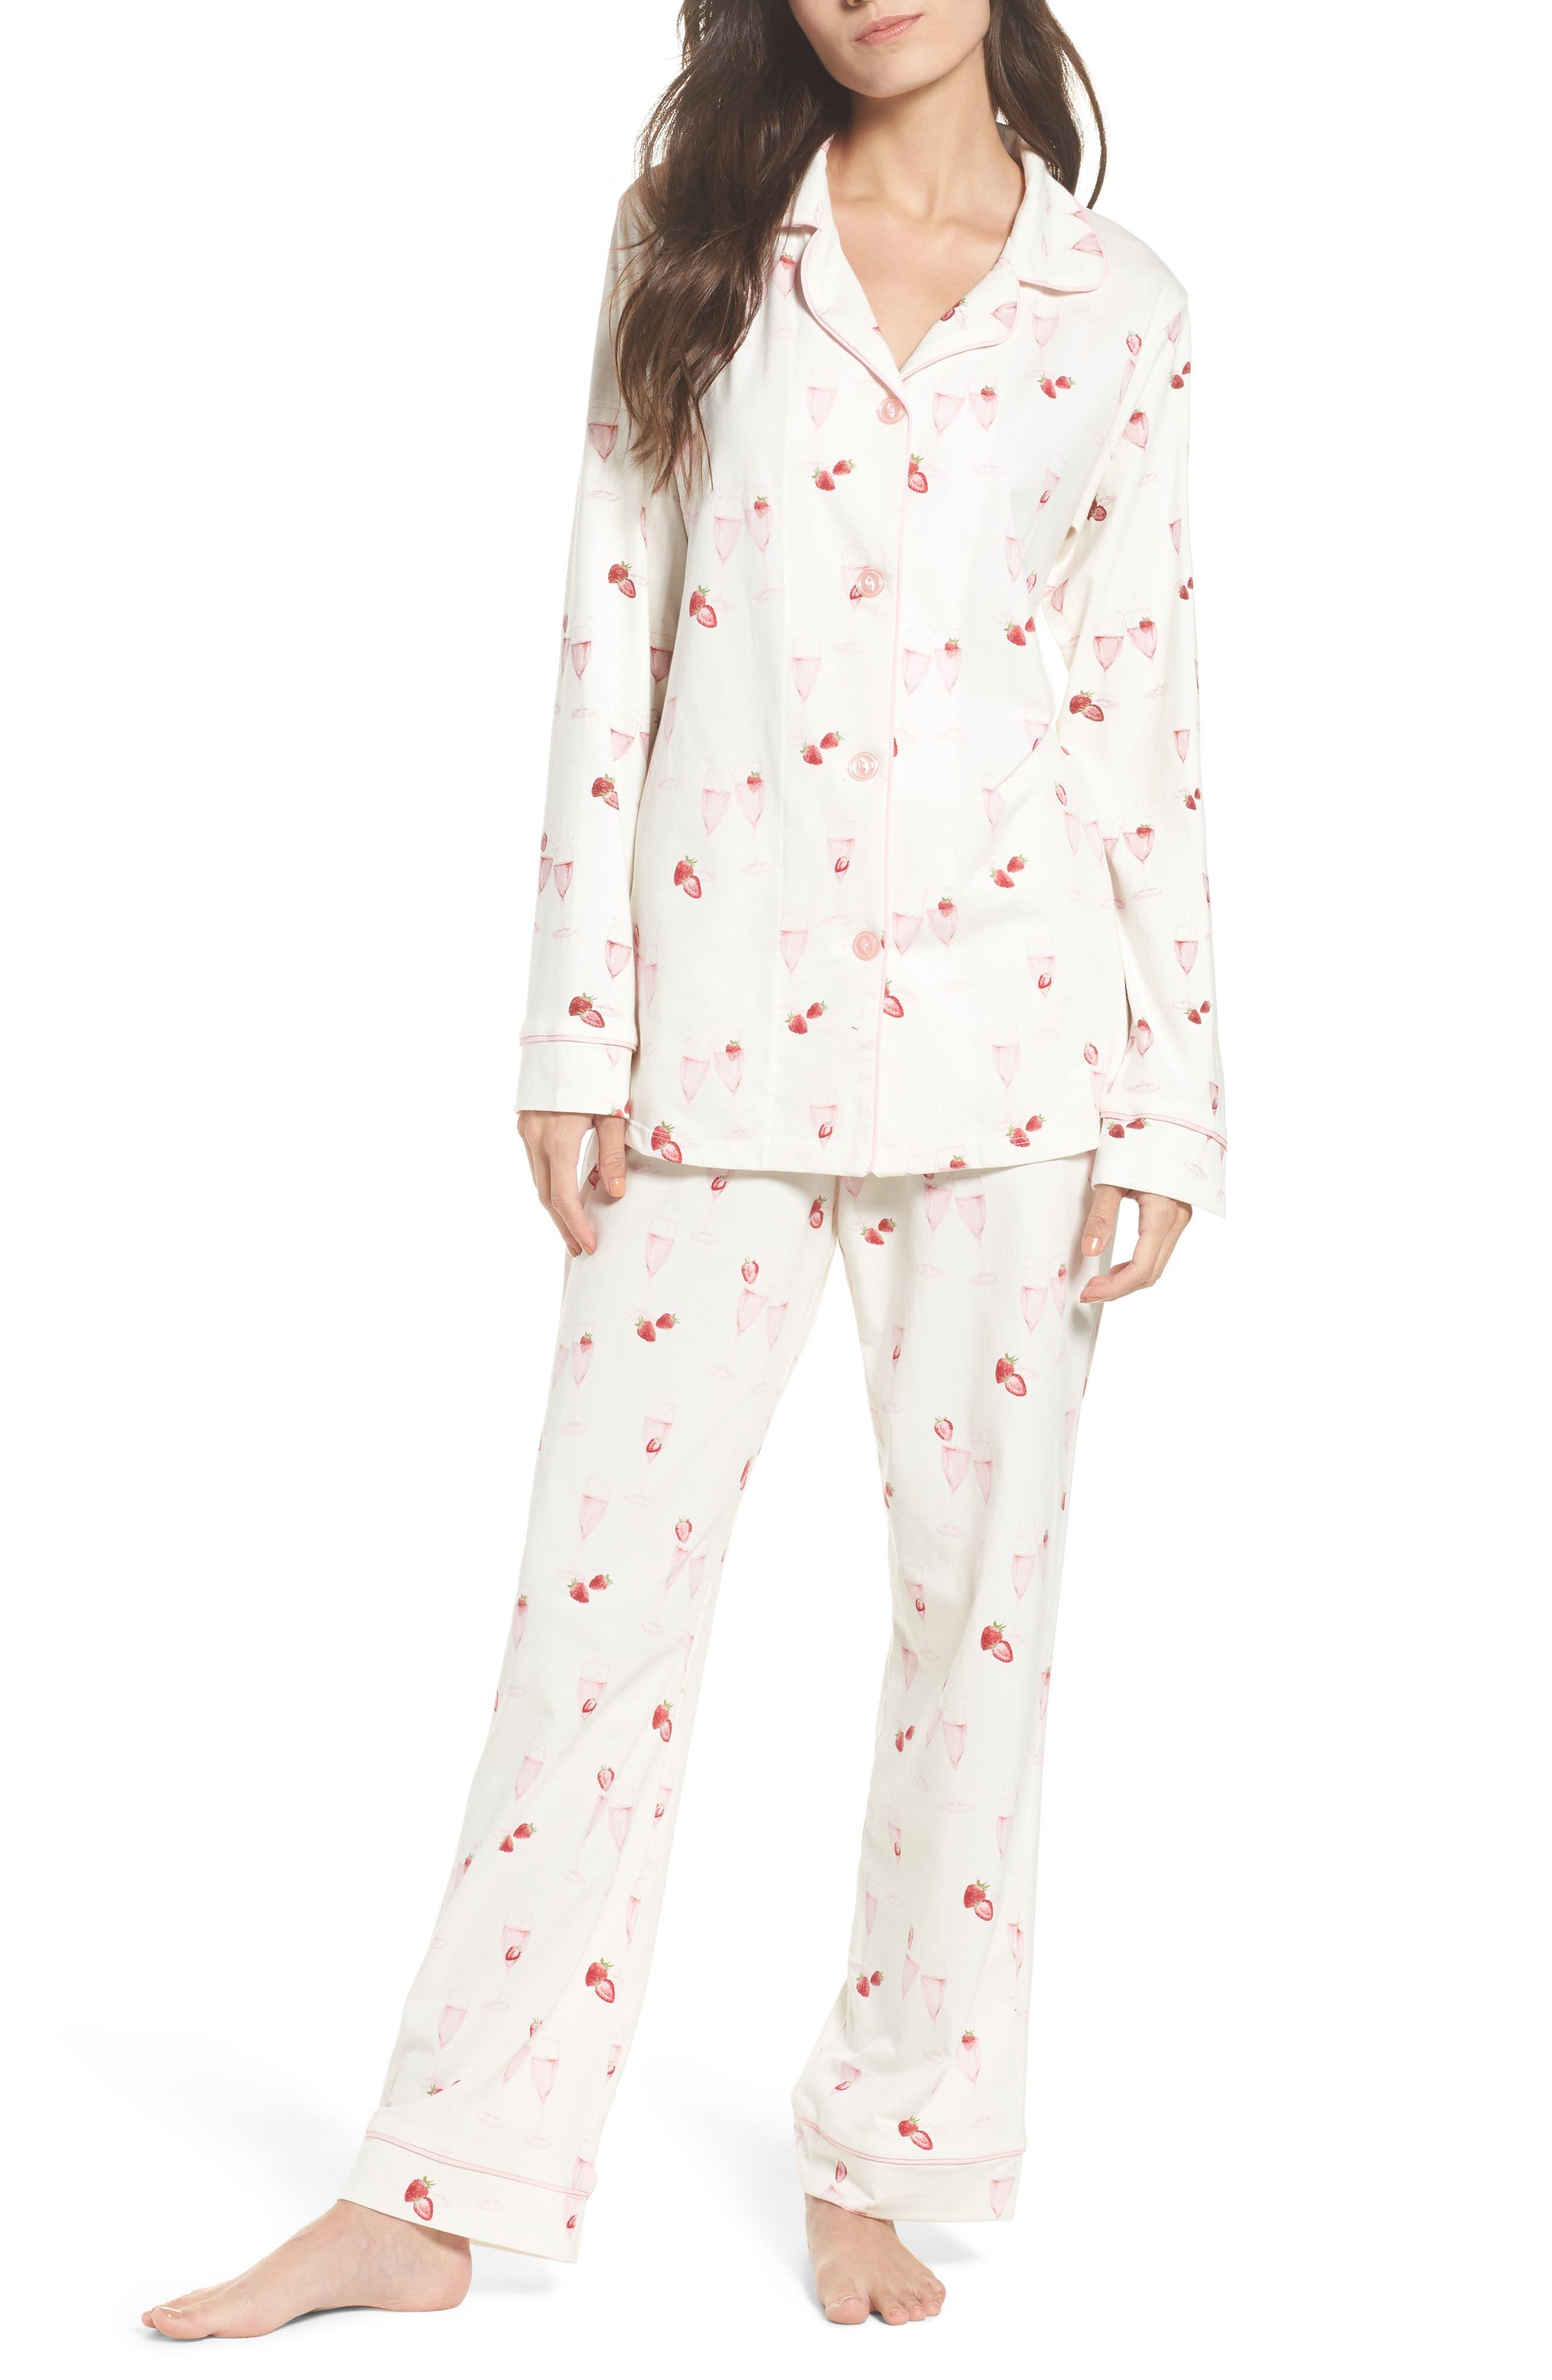 Strawberries & Champagne Print Pajamas,                             Main thumbnail 1, color,                             Strawberries And Champagne